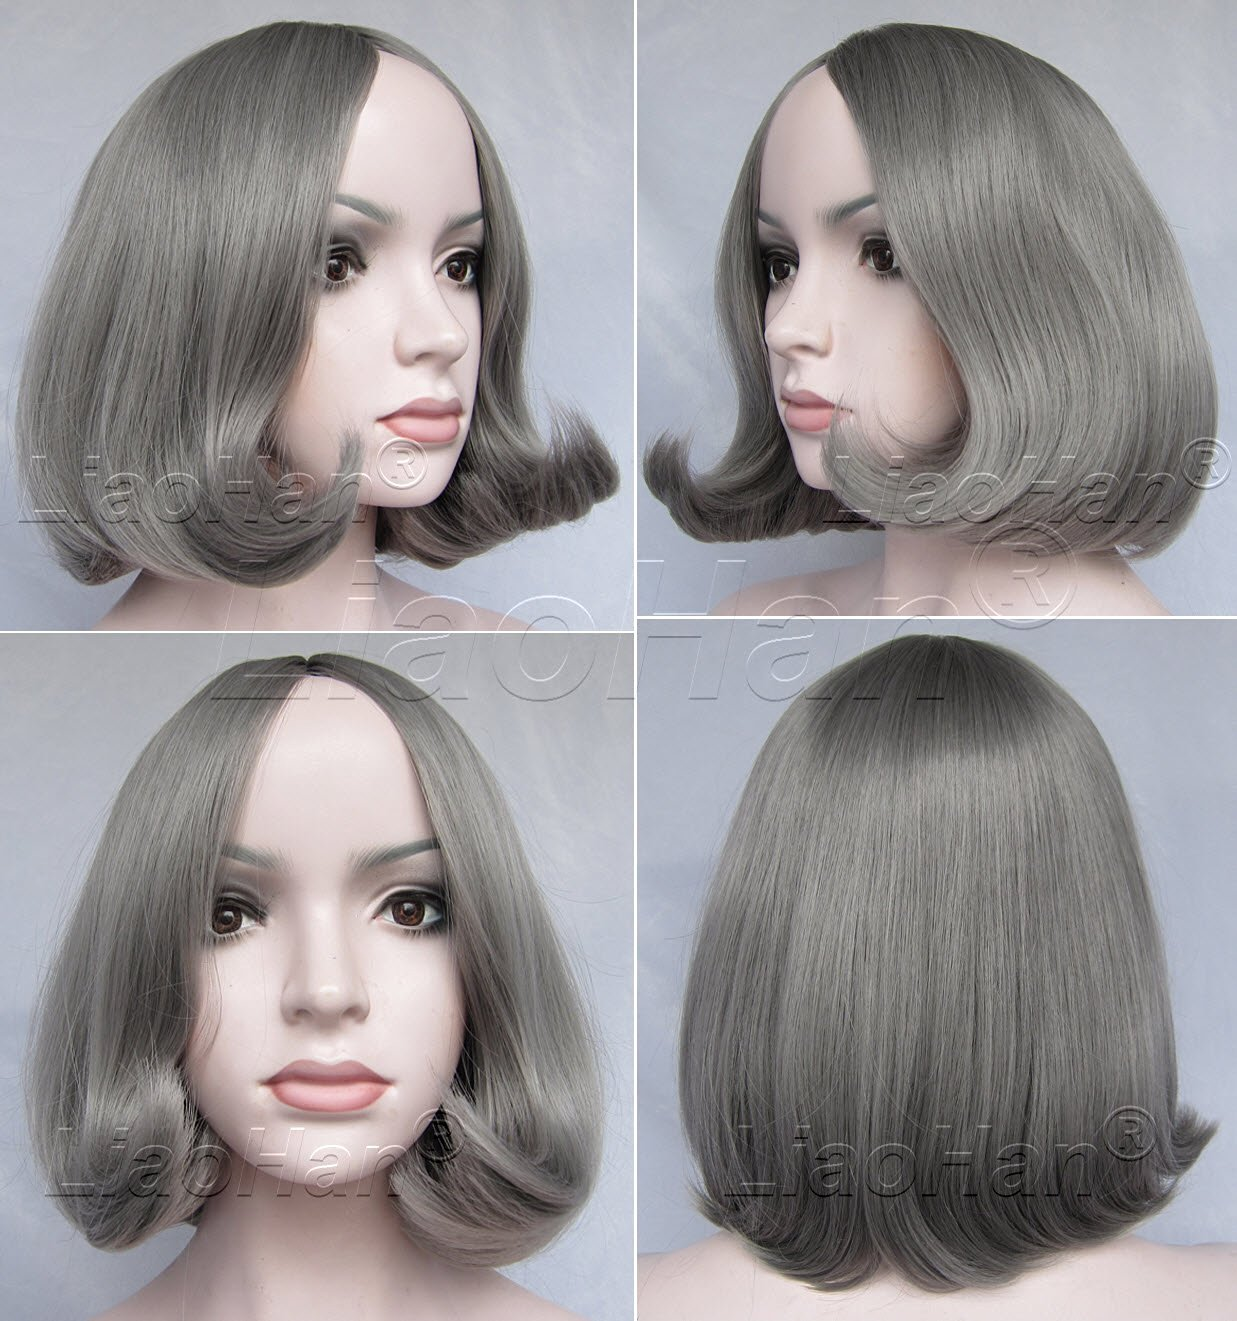 Liaohan® Fashion Short Hair Wig Smart Short Bob Hair Grey Wig Cosplay Wigs for Women with Wig Cap